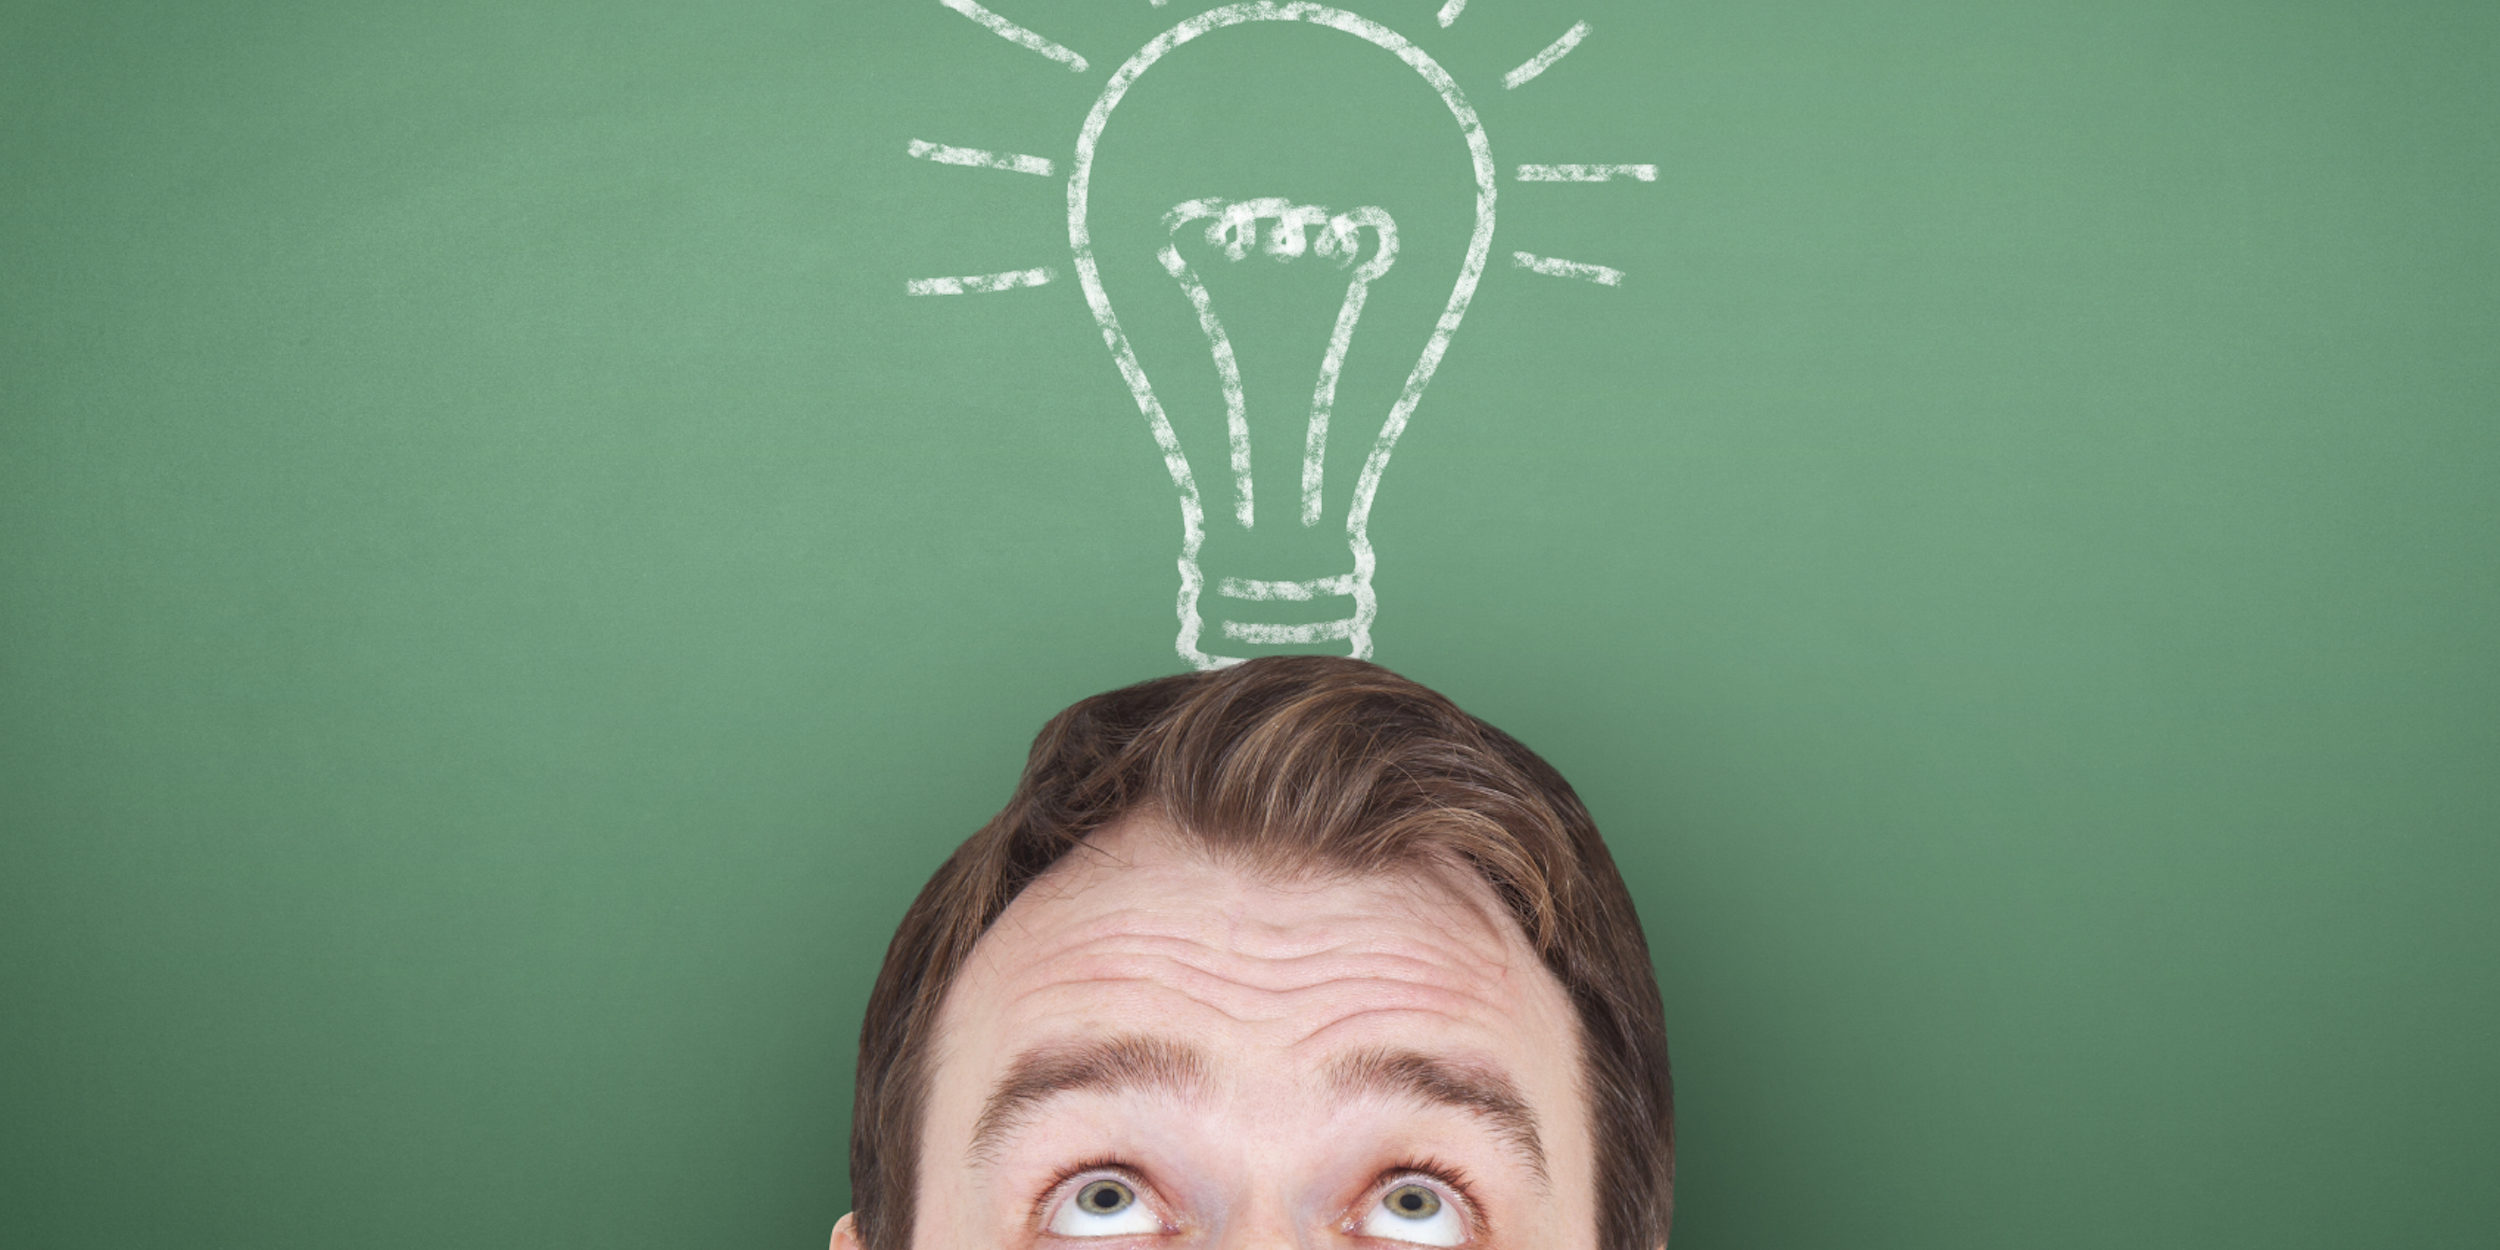 man looking at drawn light bulb copy